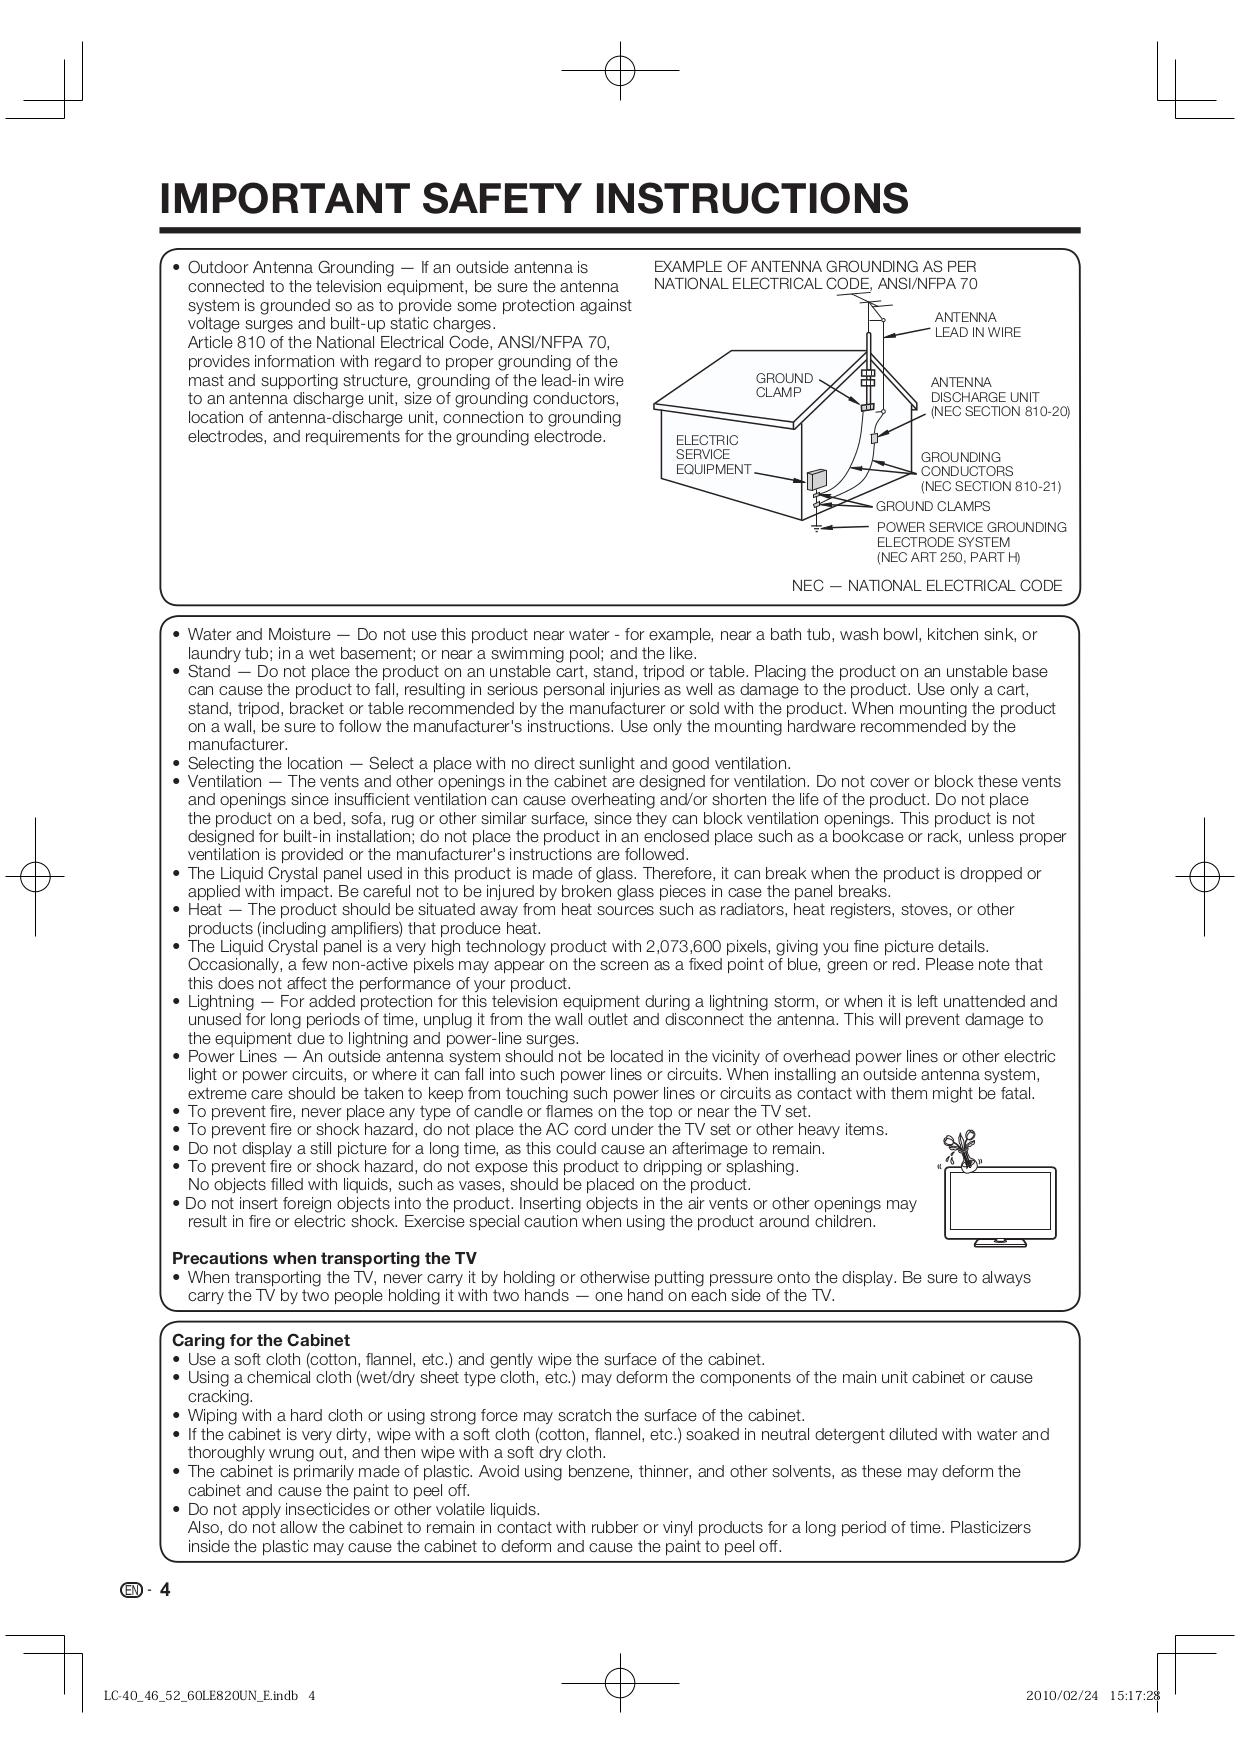 ... Sharp LCD TV AQUOS LC-52LE820UN pdf page preview ...